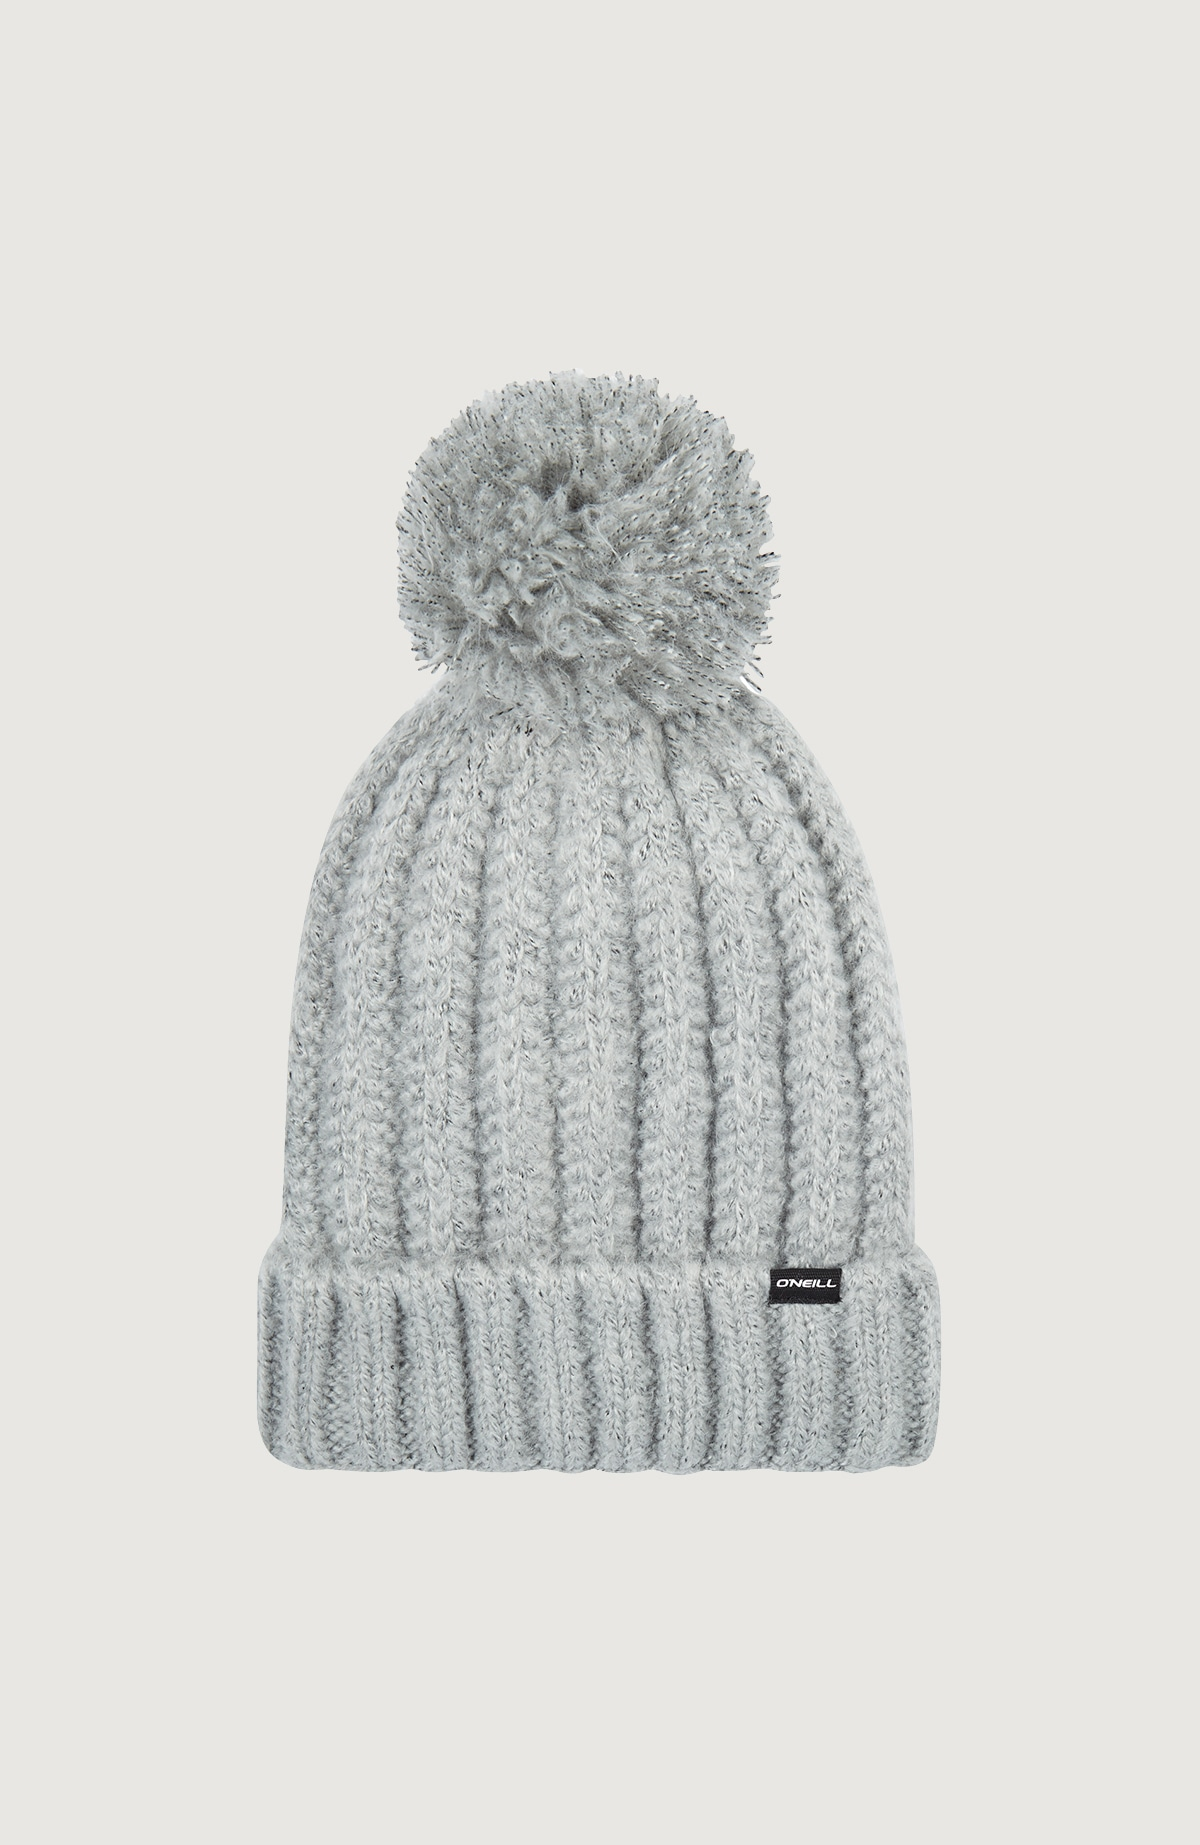 Image of O'Neill Mütze »Bw chunky knit«